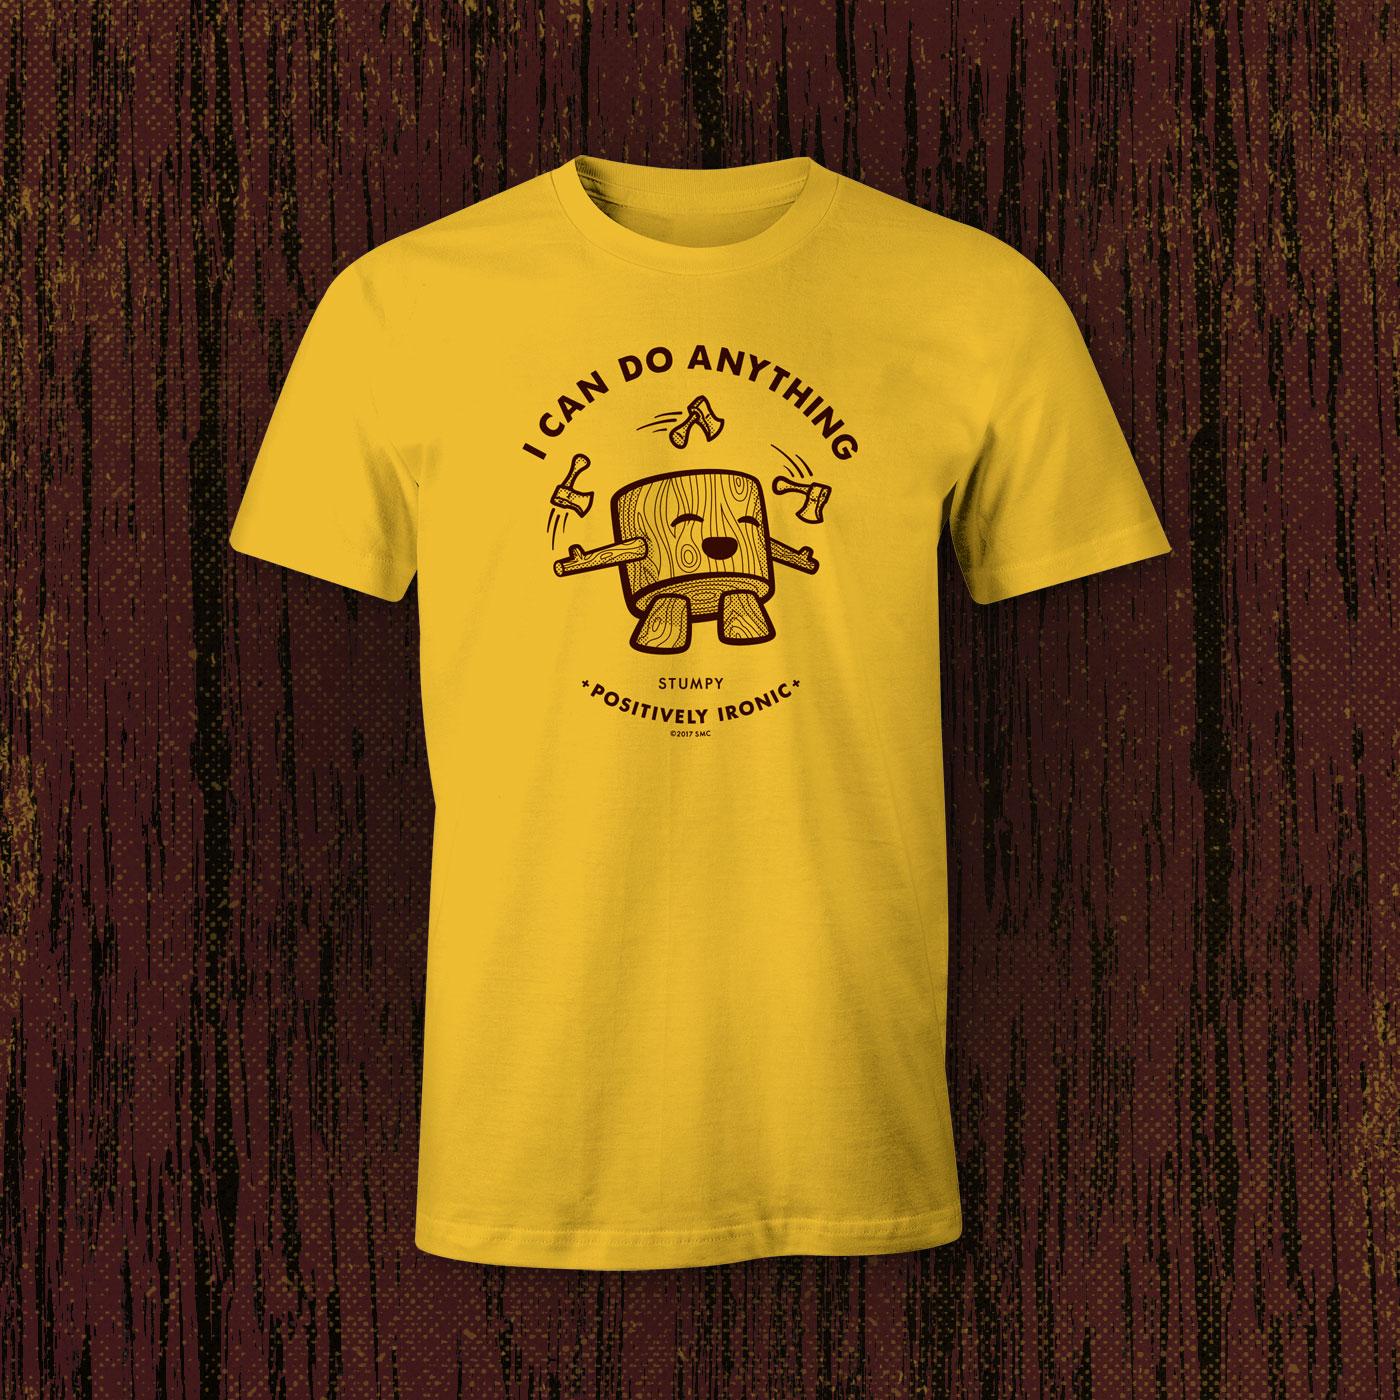 Stumpy Tshirt Designer Dallas TX